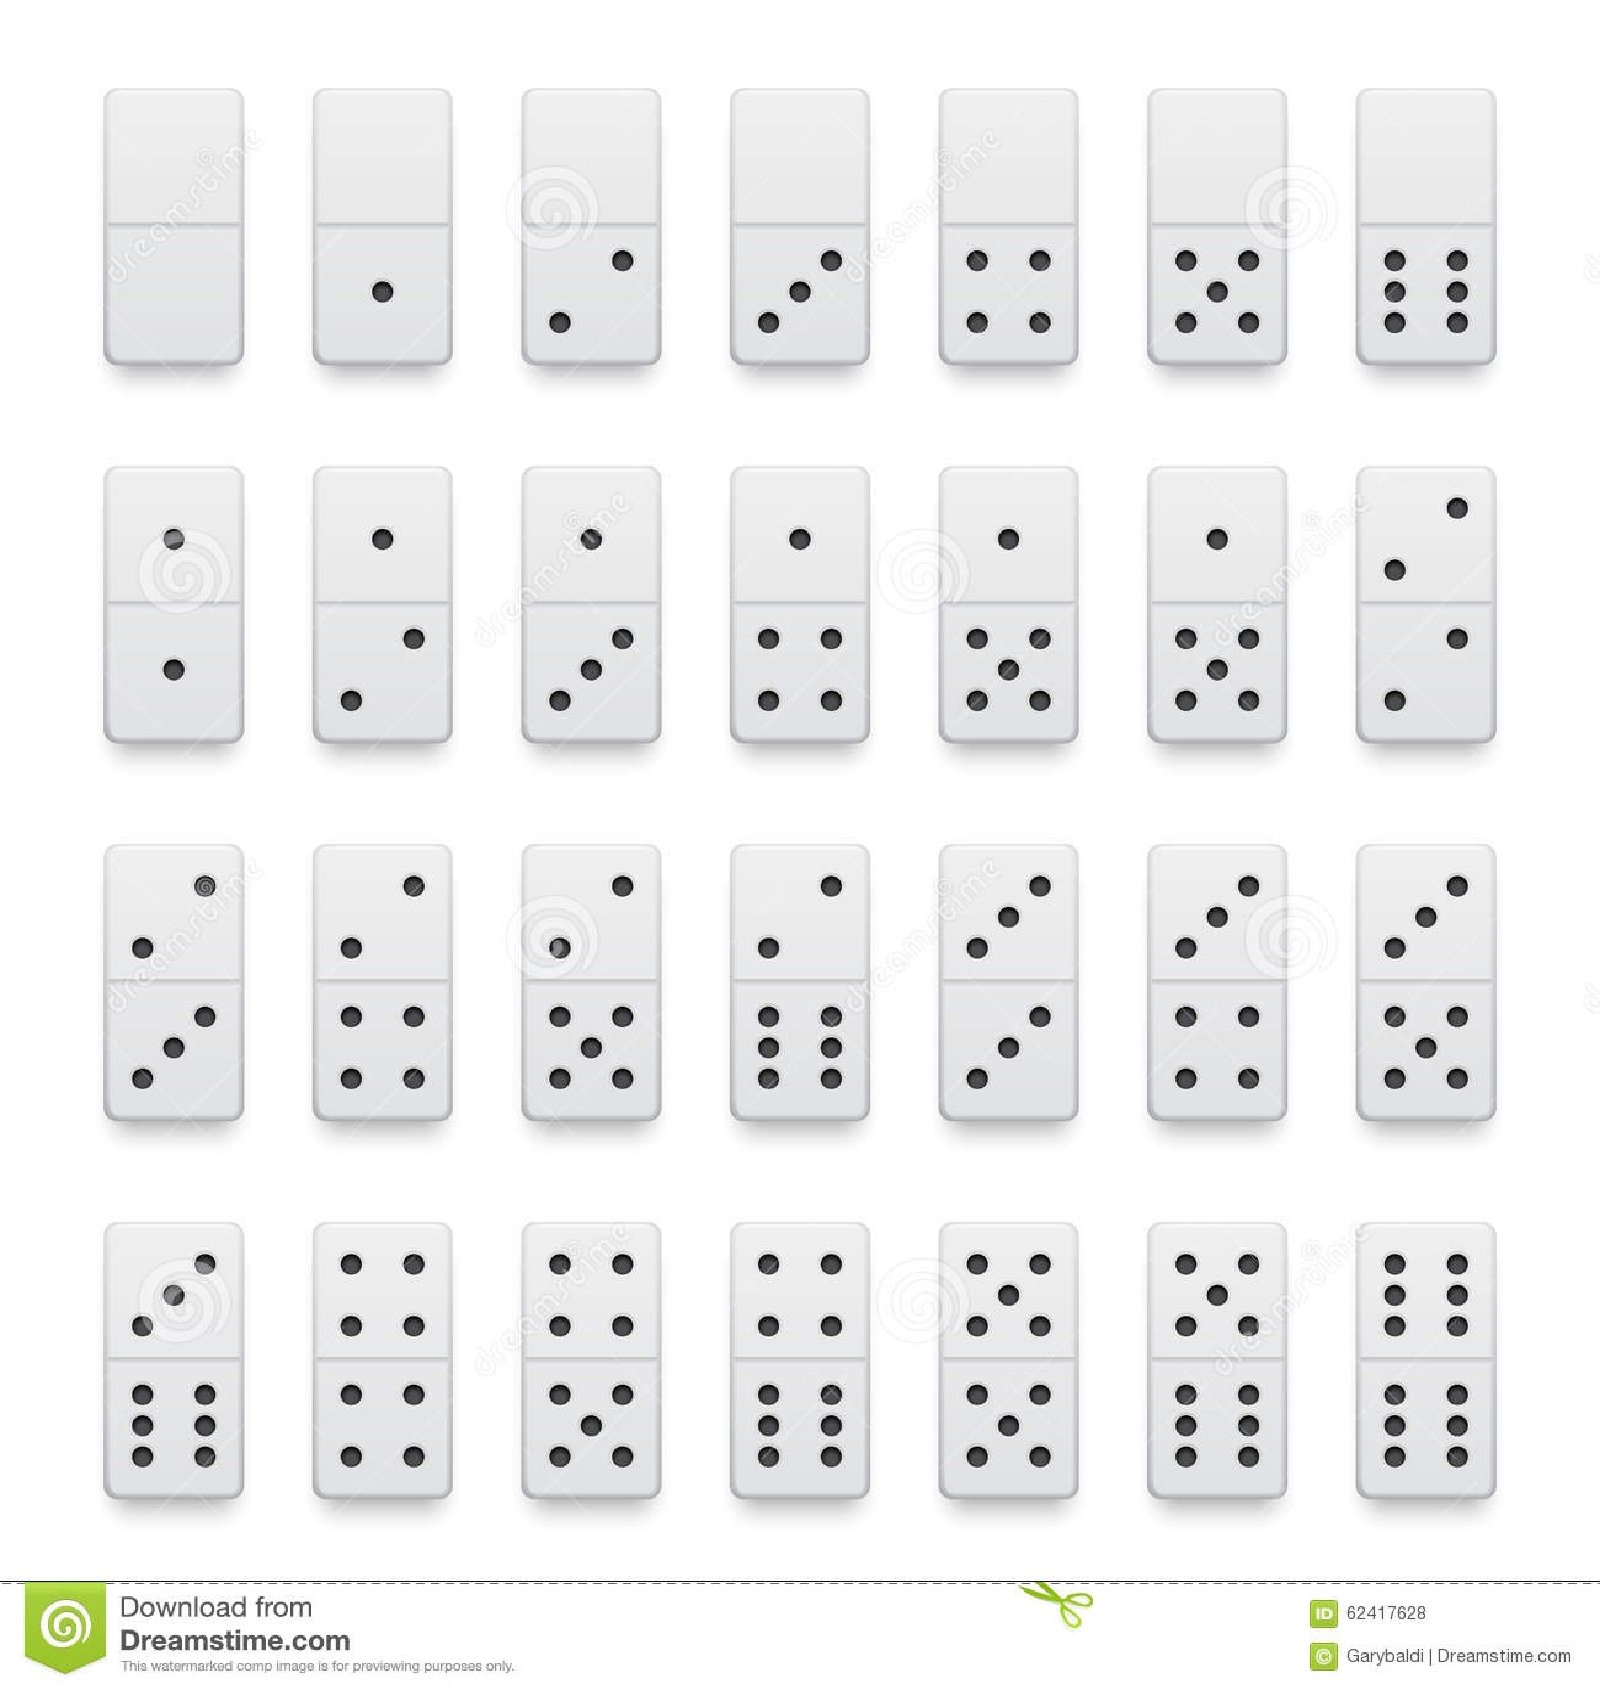 ensemble complet des morceaux blancs r alistes de domino illustration stock illustration du. Black Bedroom Furniture Sets. Home Design Ideas